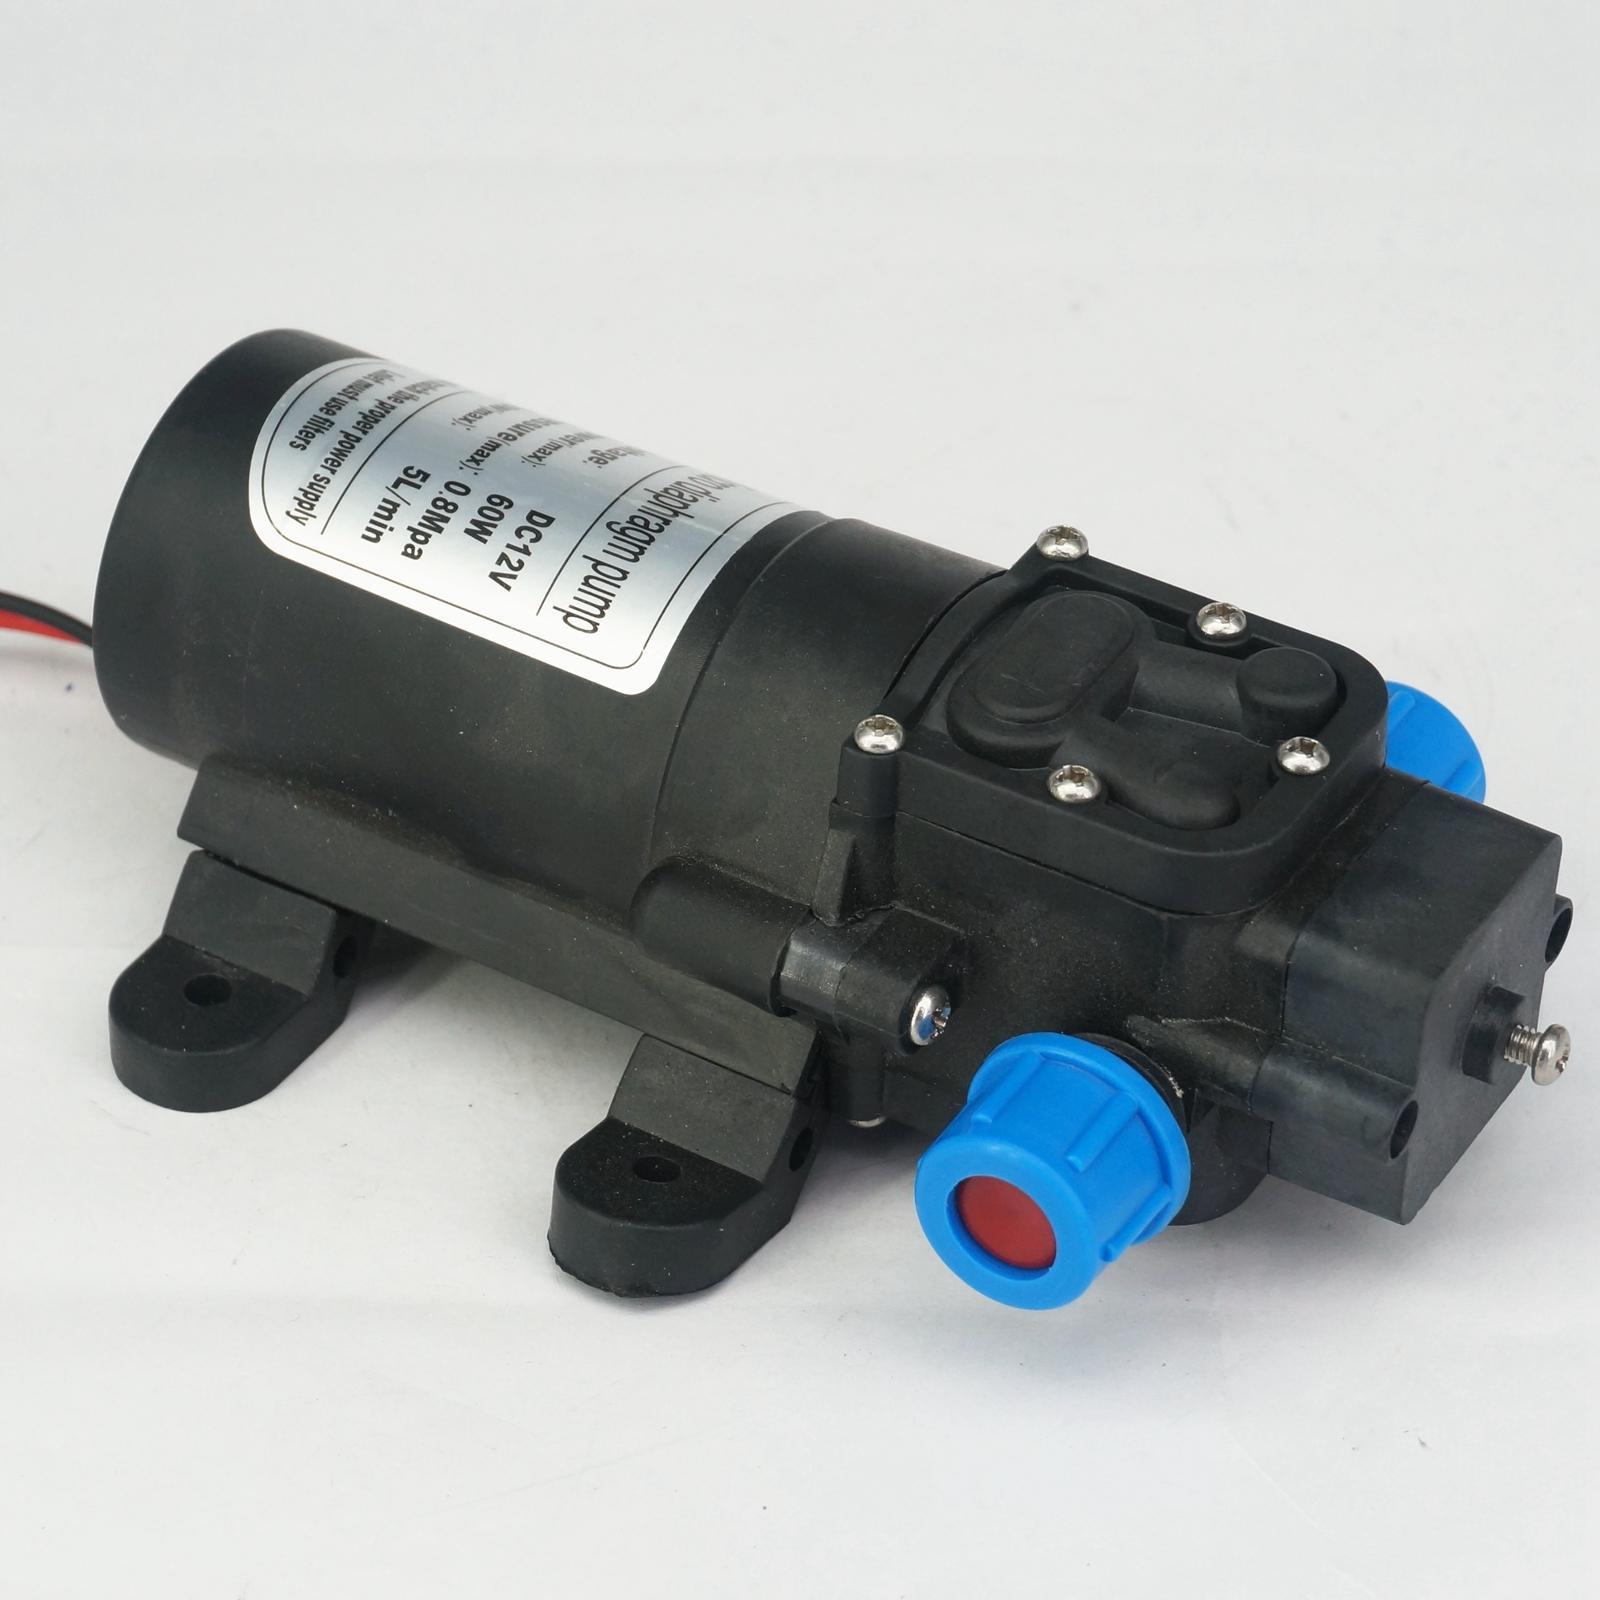 12V DC Electric Mini Diaphragm Pump Self-priming Booster Pumnp Low Traffic For  Car Washer 60W 240L/H 0-60 Degree Celsius